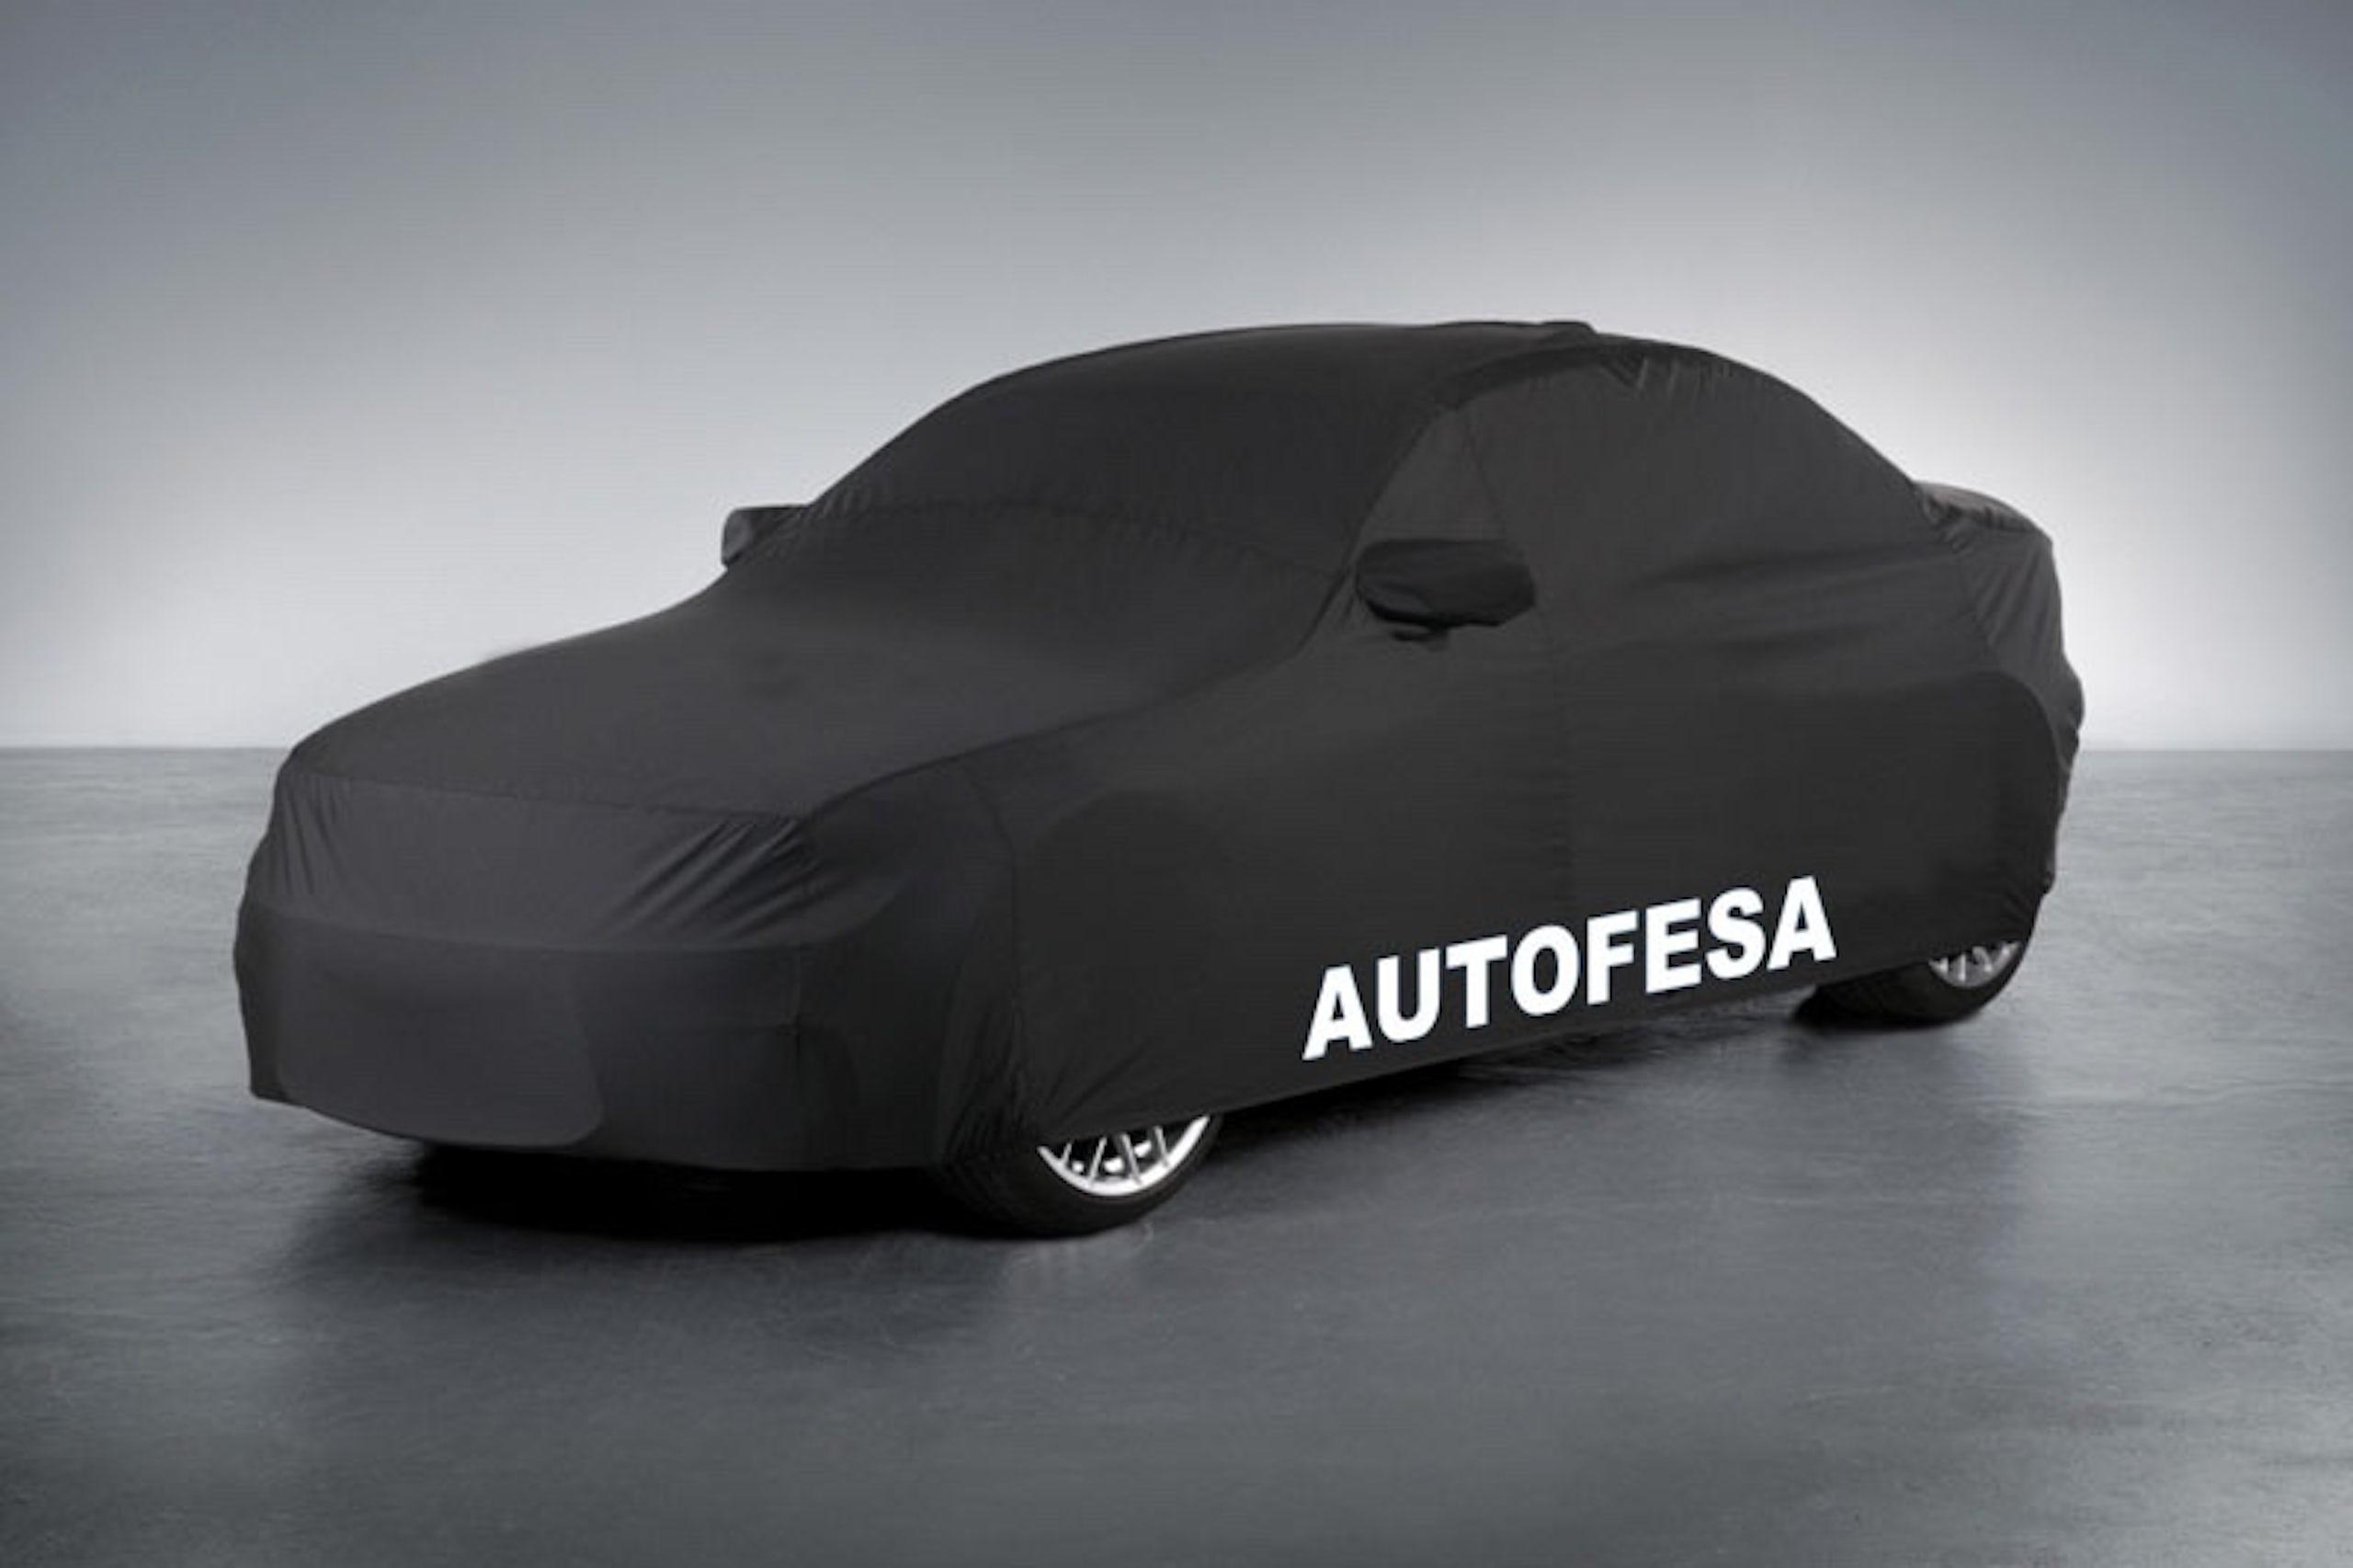 Mitsubishi Outlander 2.0 DI-D 150cv Motion 2WD 5p 7plz Auto S/S - Foto 20